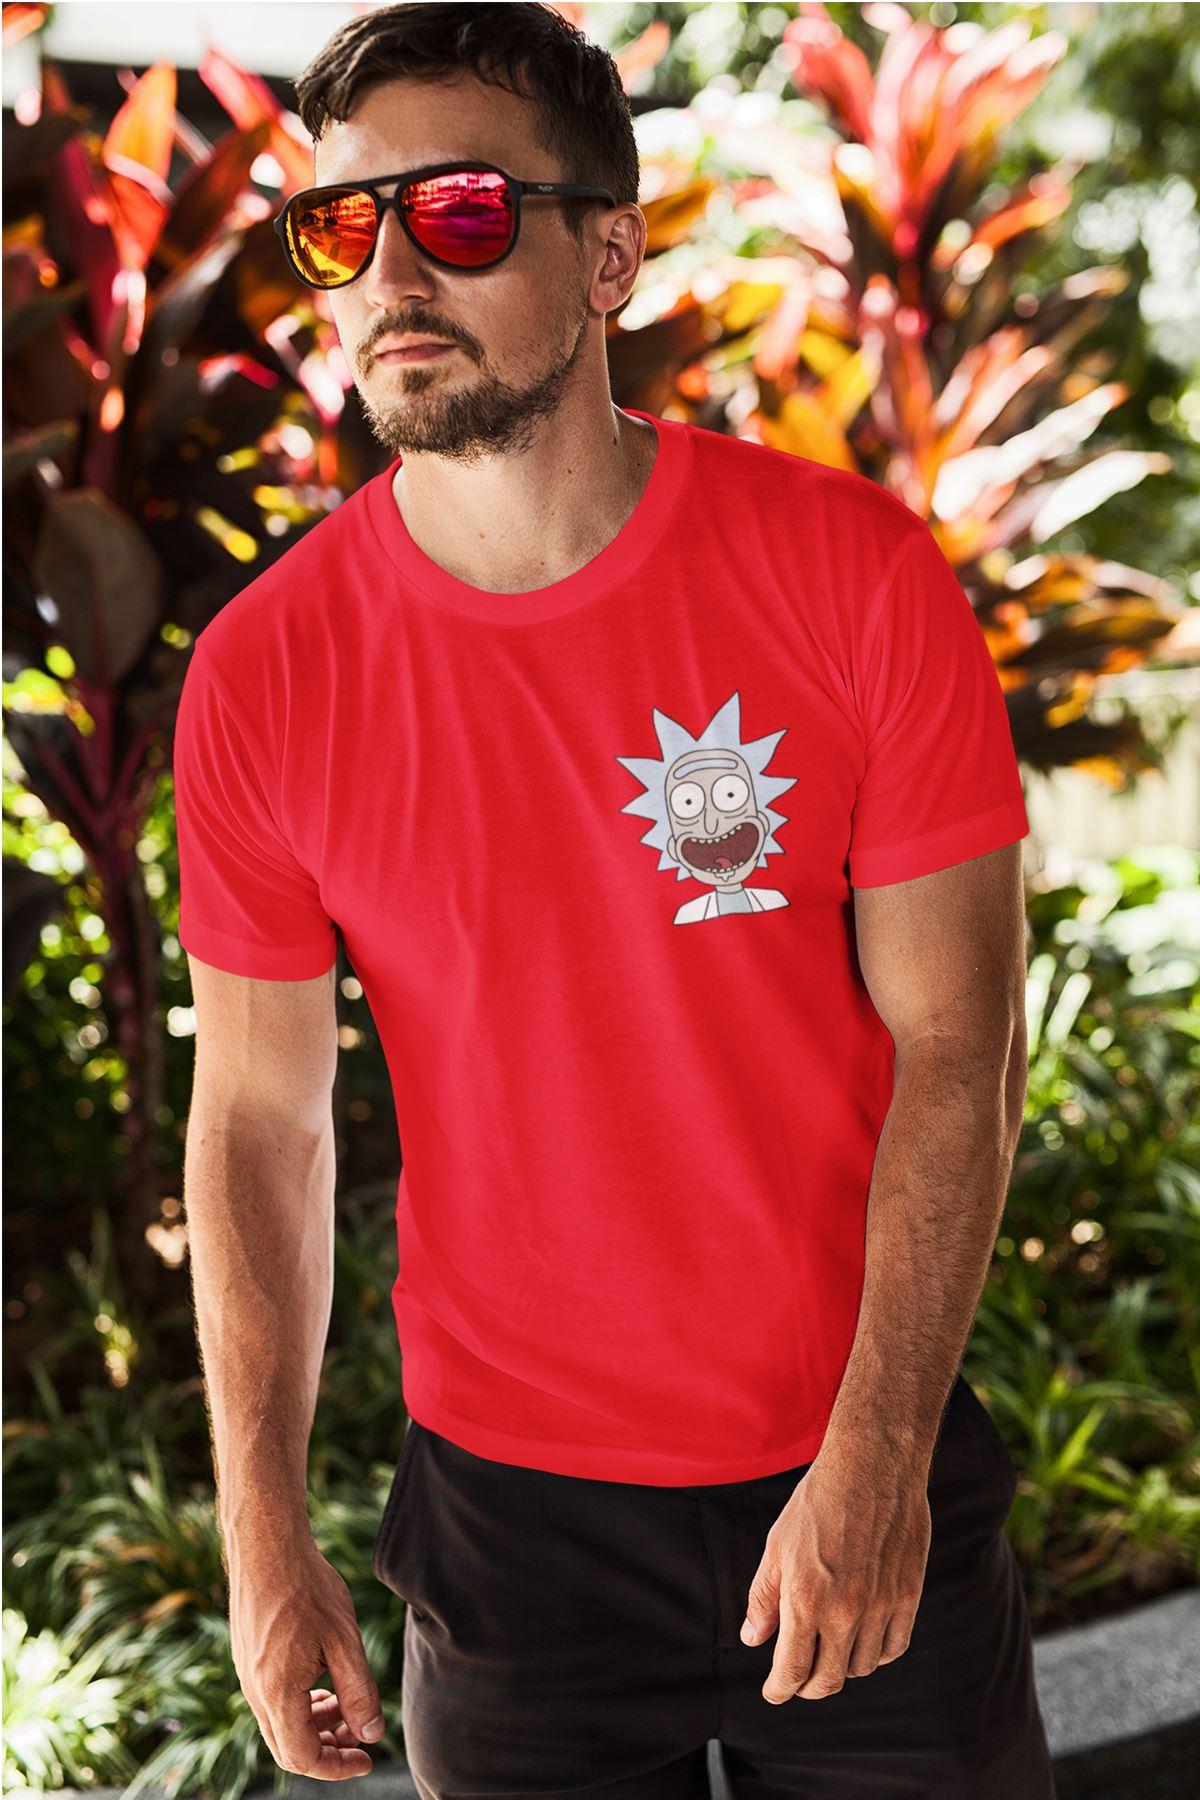 Rick Kırmızı Erkek Tshirt - Tişört